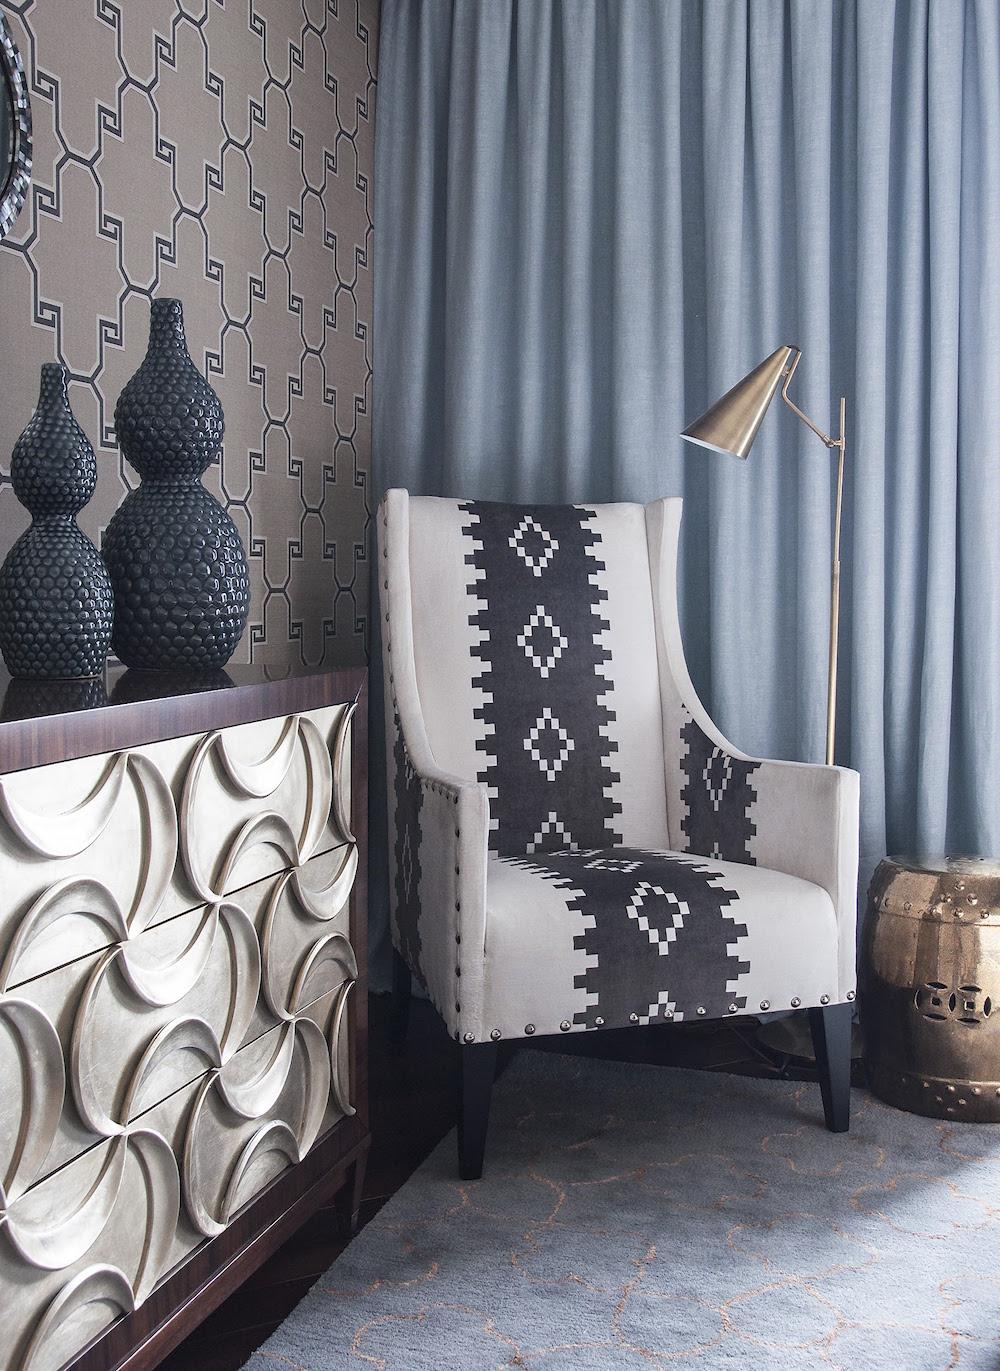 Art decor apartment accent chair